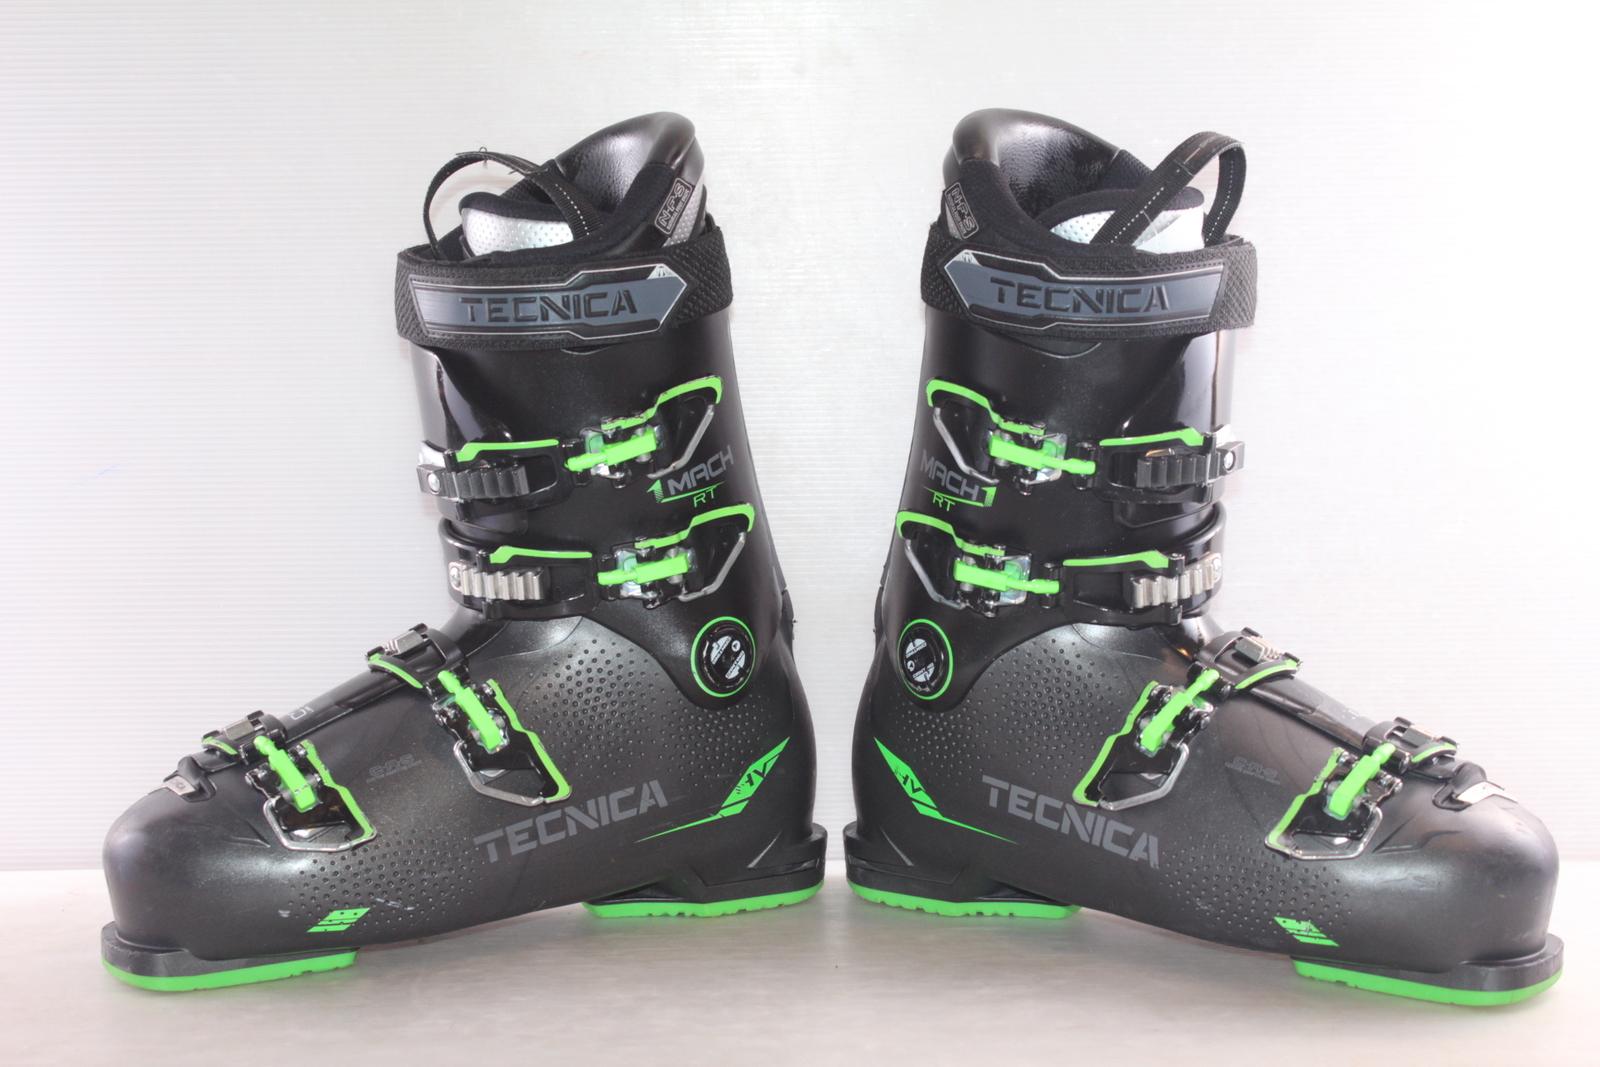 Lyžařské boty Tecnica Mach RT 1 vel. EU46 flexe 100